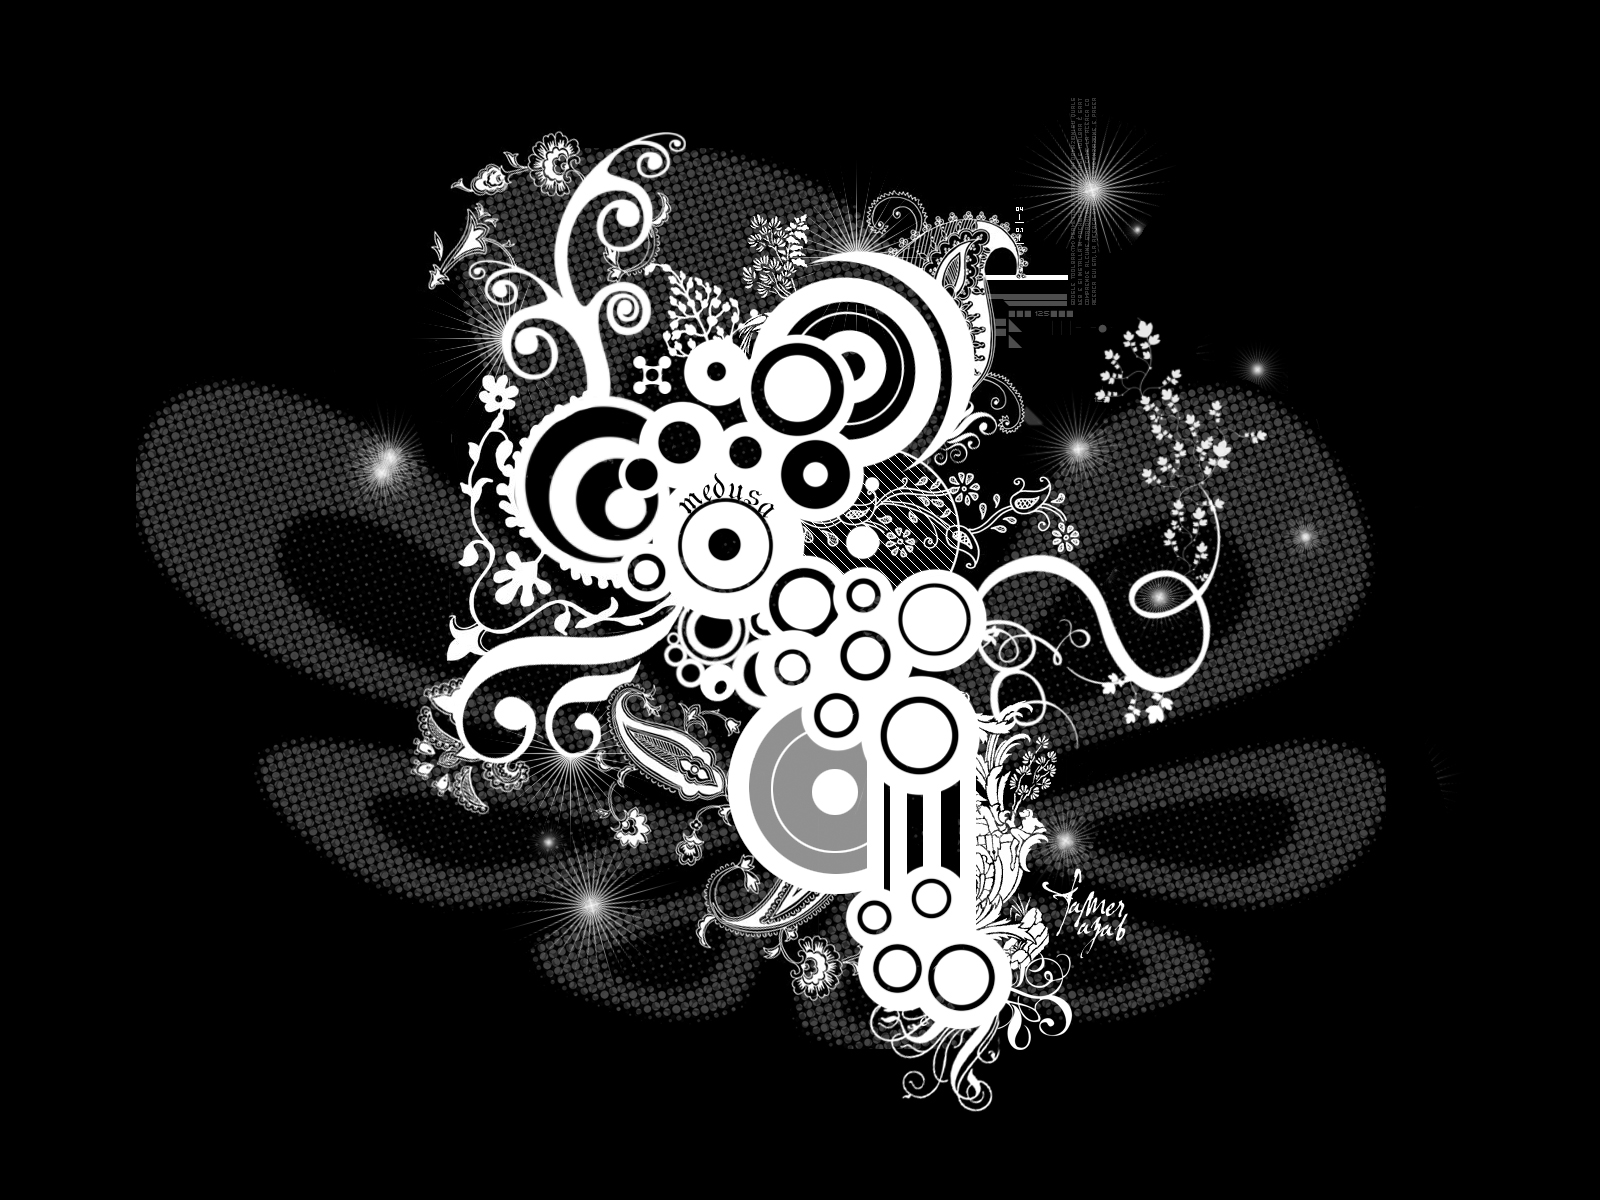 Medusa - Wallpaper by t4m3r on DeviantArt